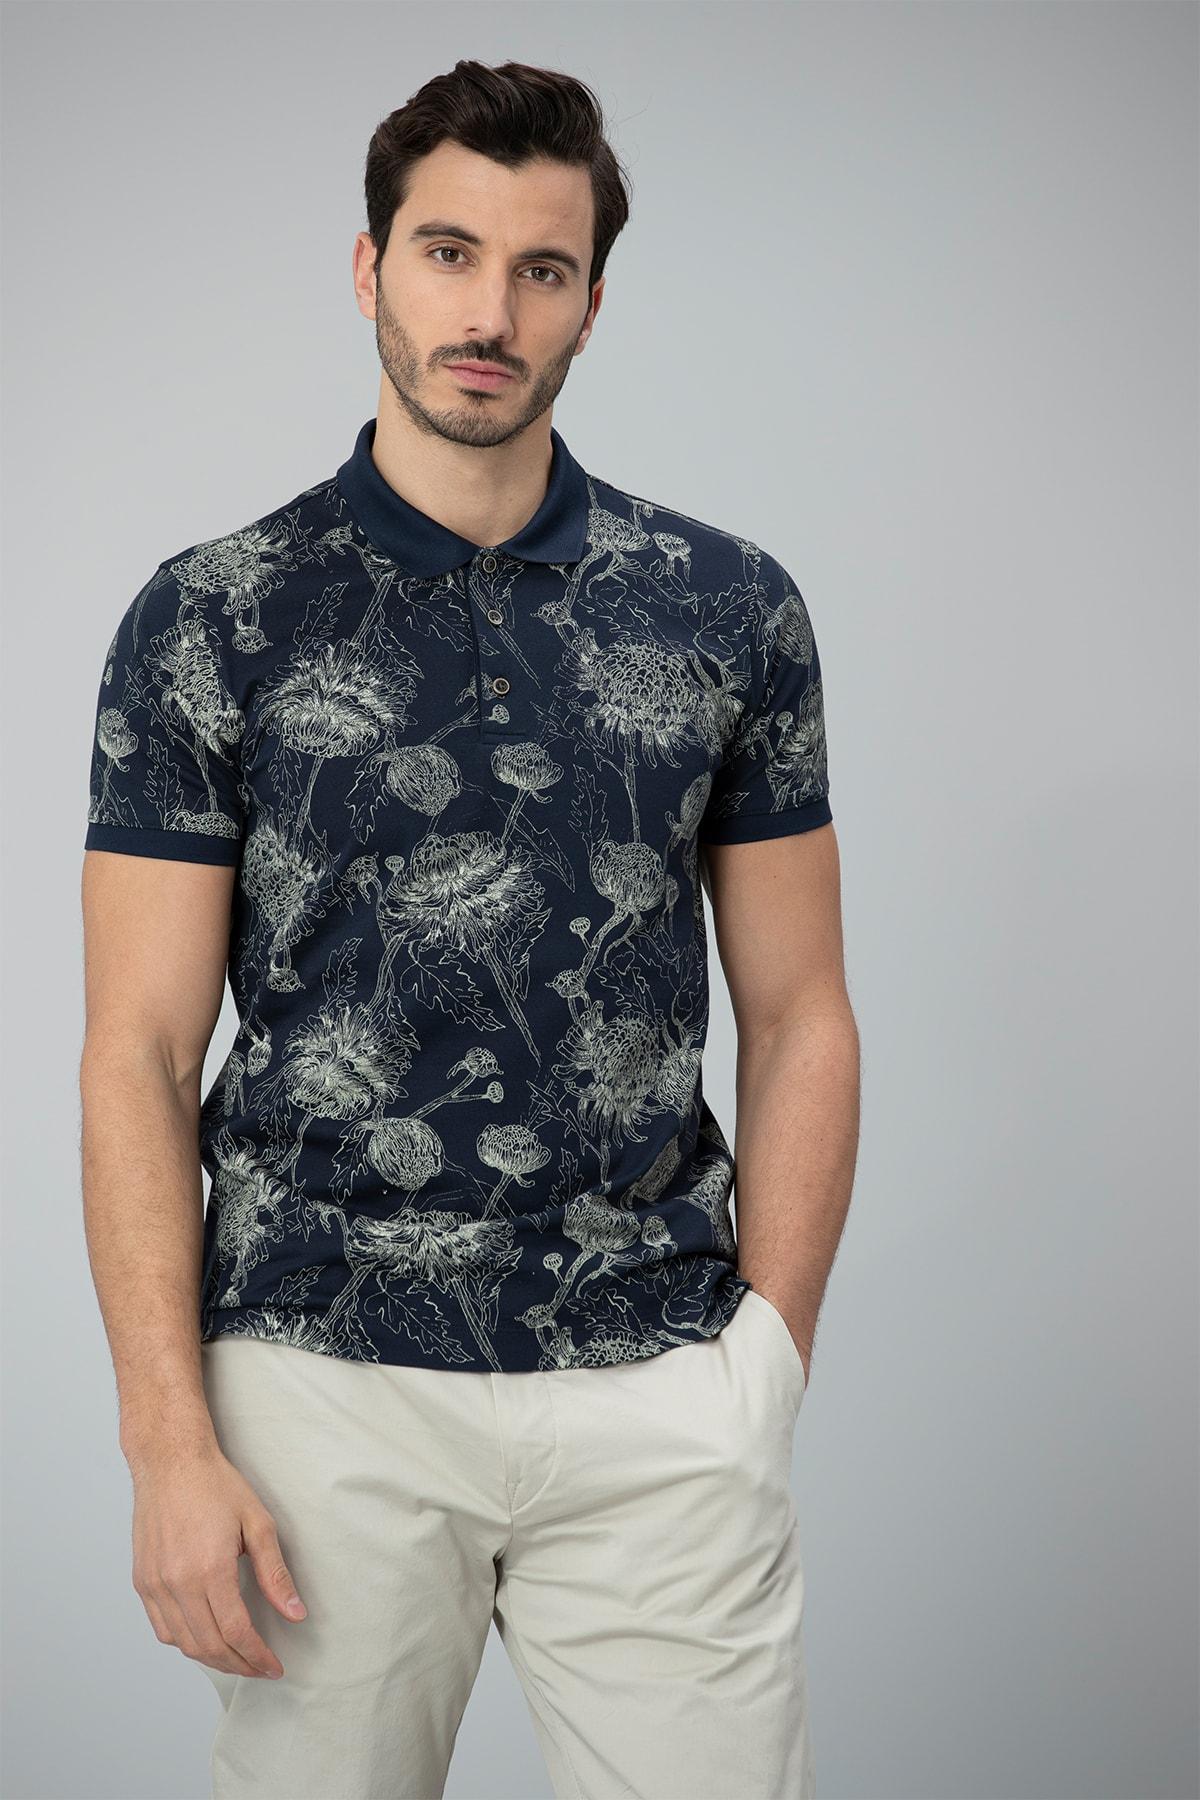 Lufian Capri Spor Polo T- Shirt Lacivert 0